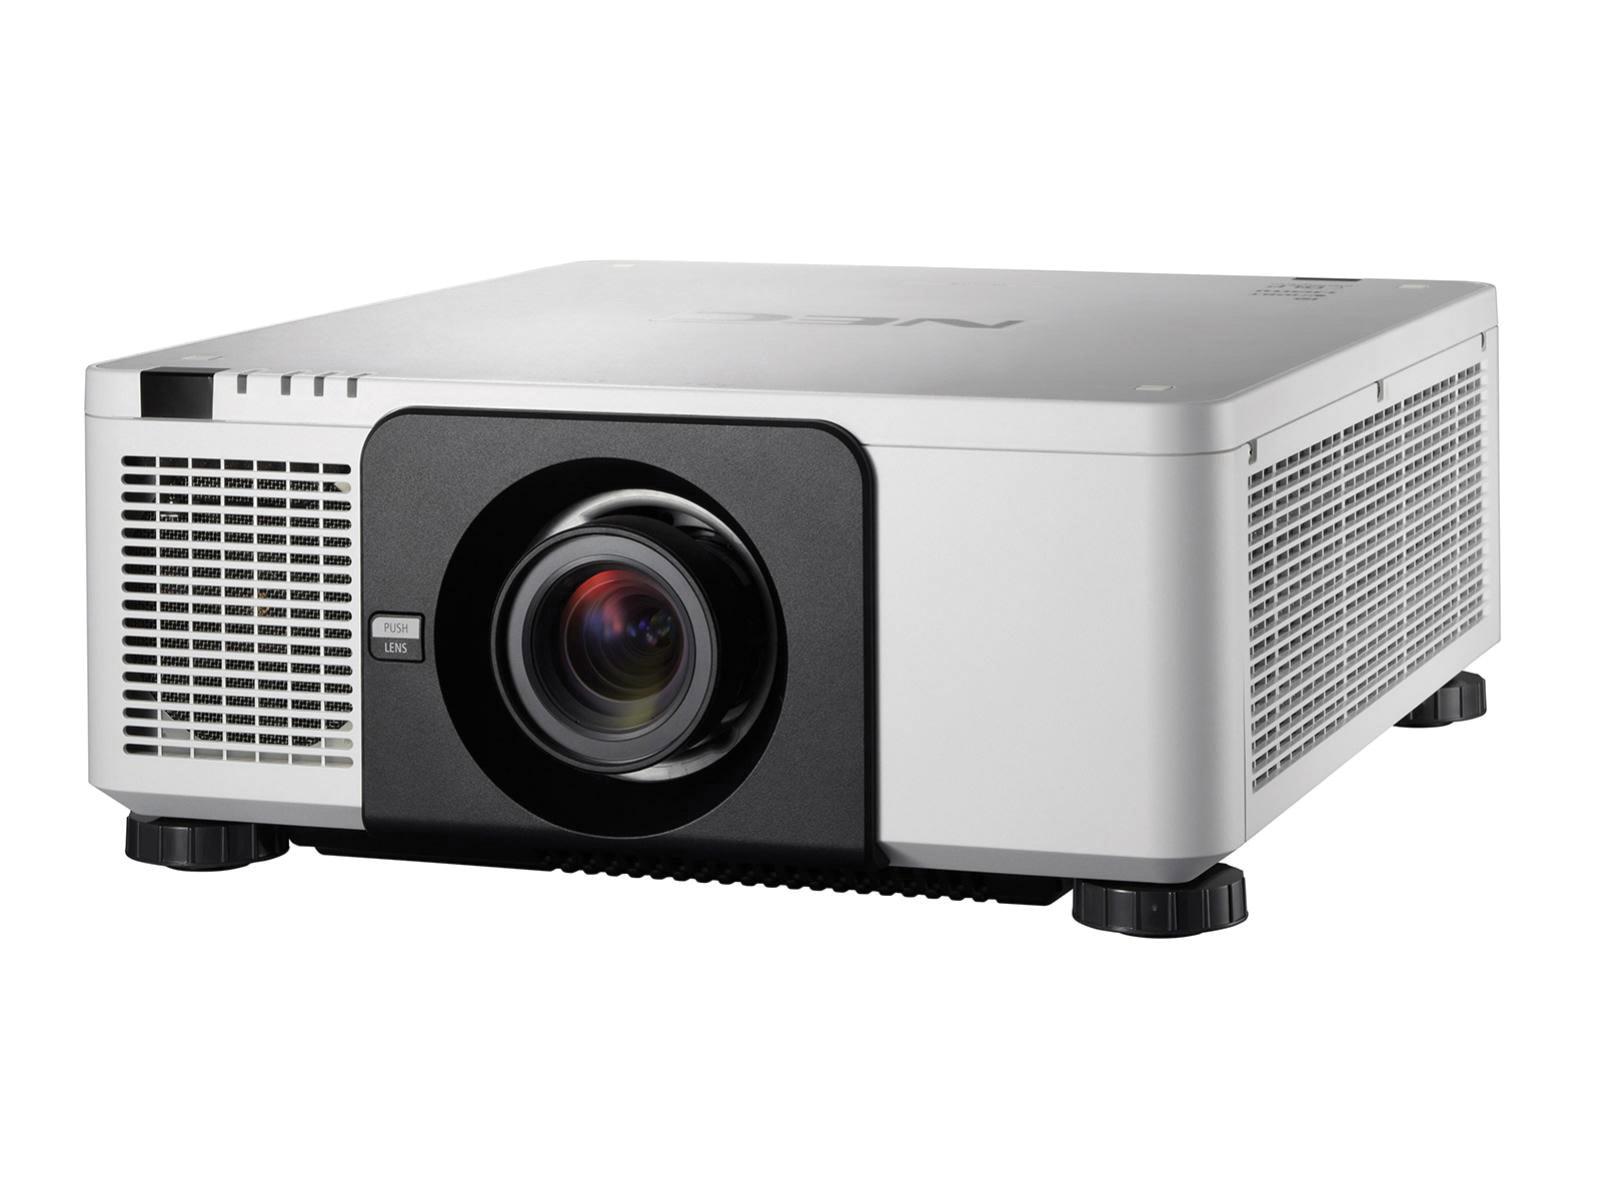 NEC, PX1004UL, DLP, Laser, Projector/, WUXGA/, 10000ANSI/, 10000:1/, HDMI/, 20W, x1/, HDBaseT, /, Optional, lens,